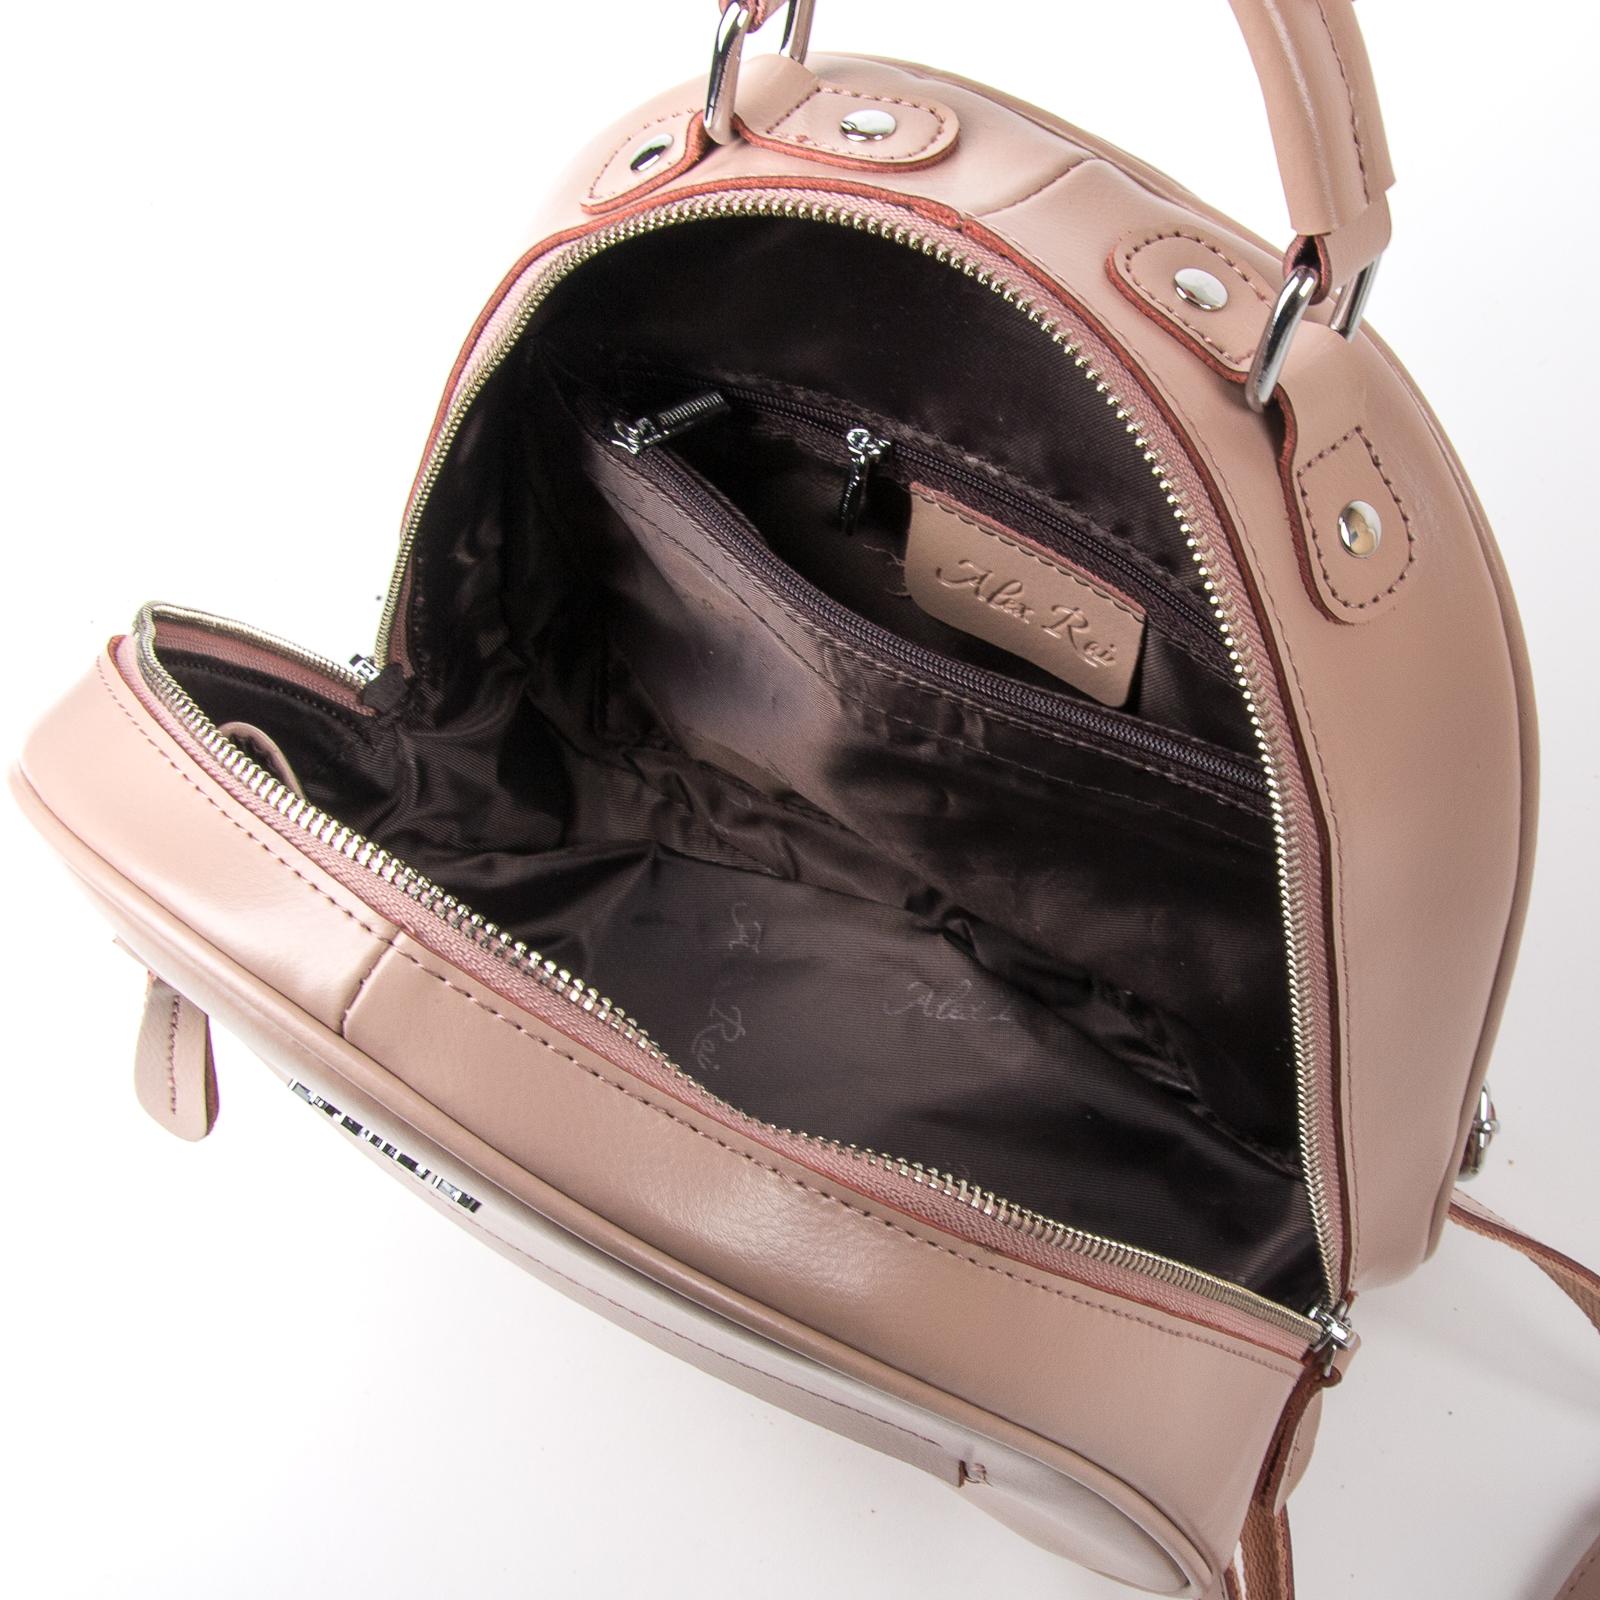 Сумка Женская Рюкзак кожа ALEX RAI 03-01 8715 pink - фото 5